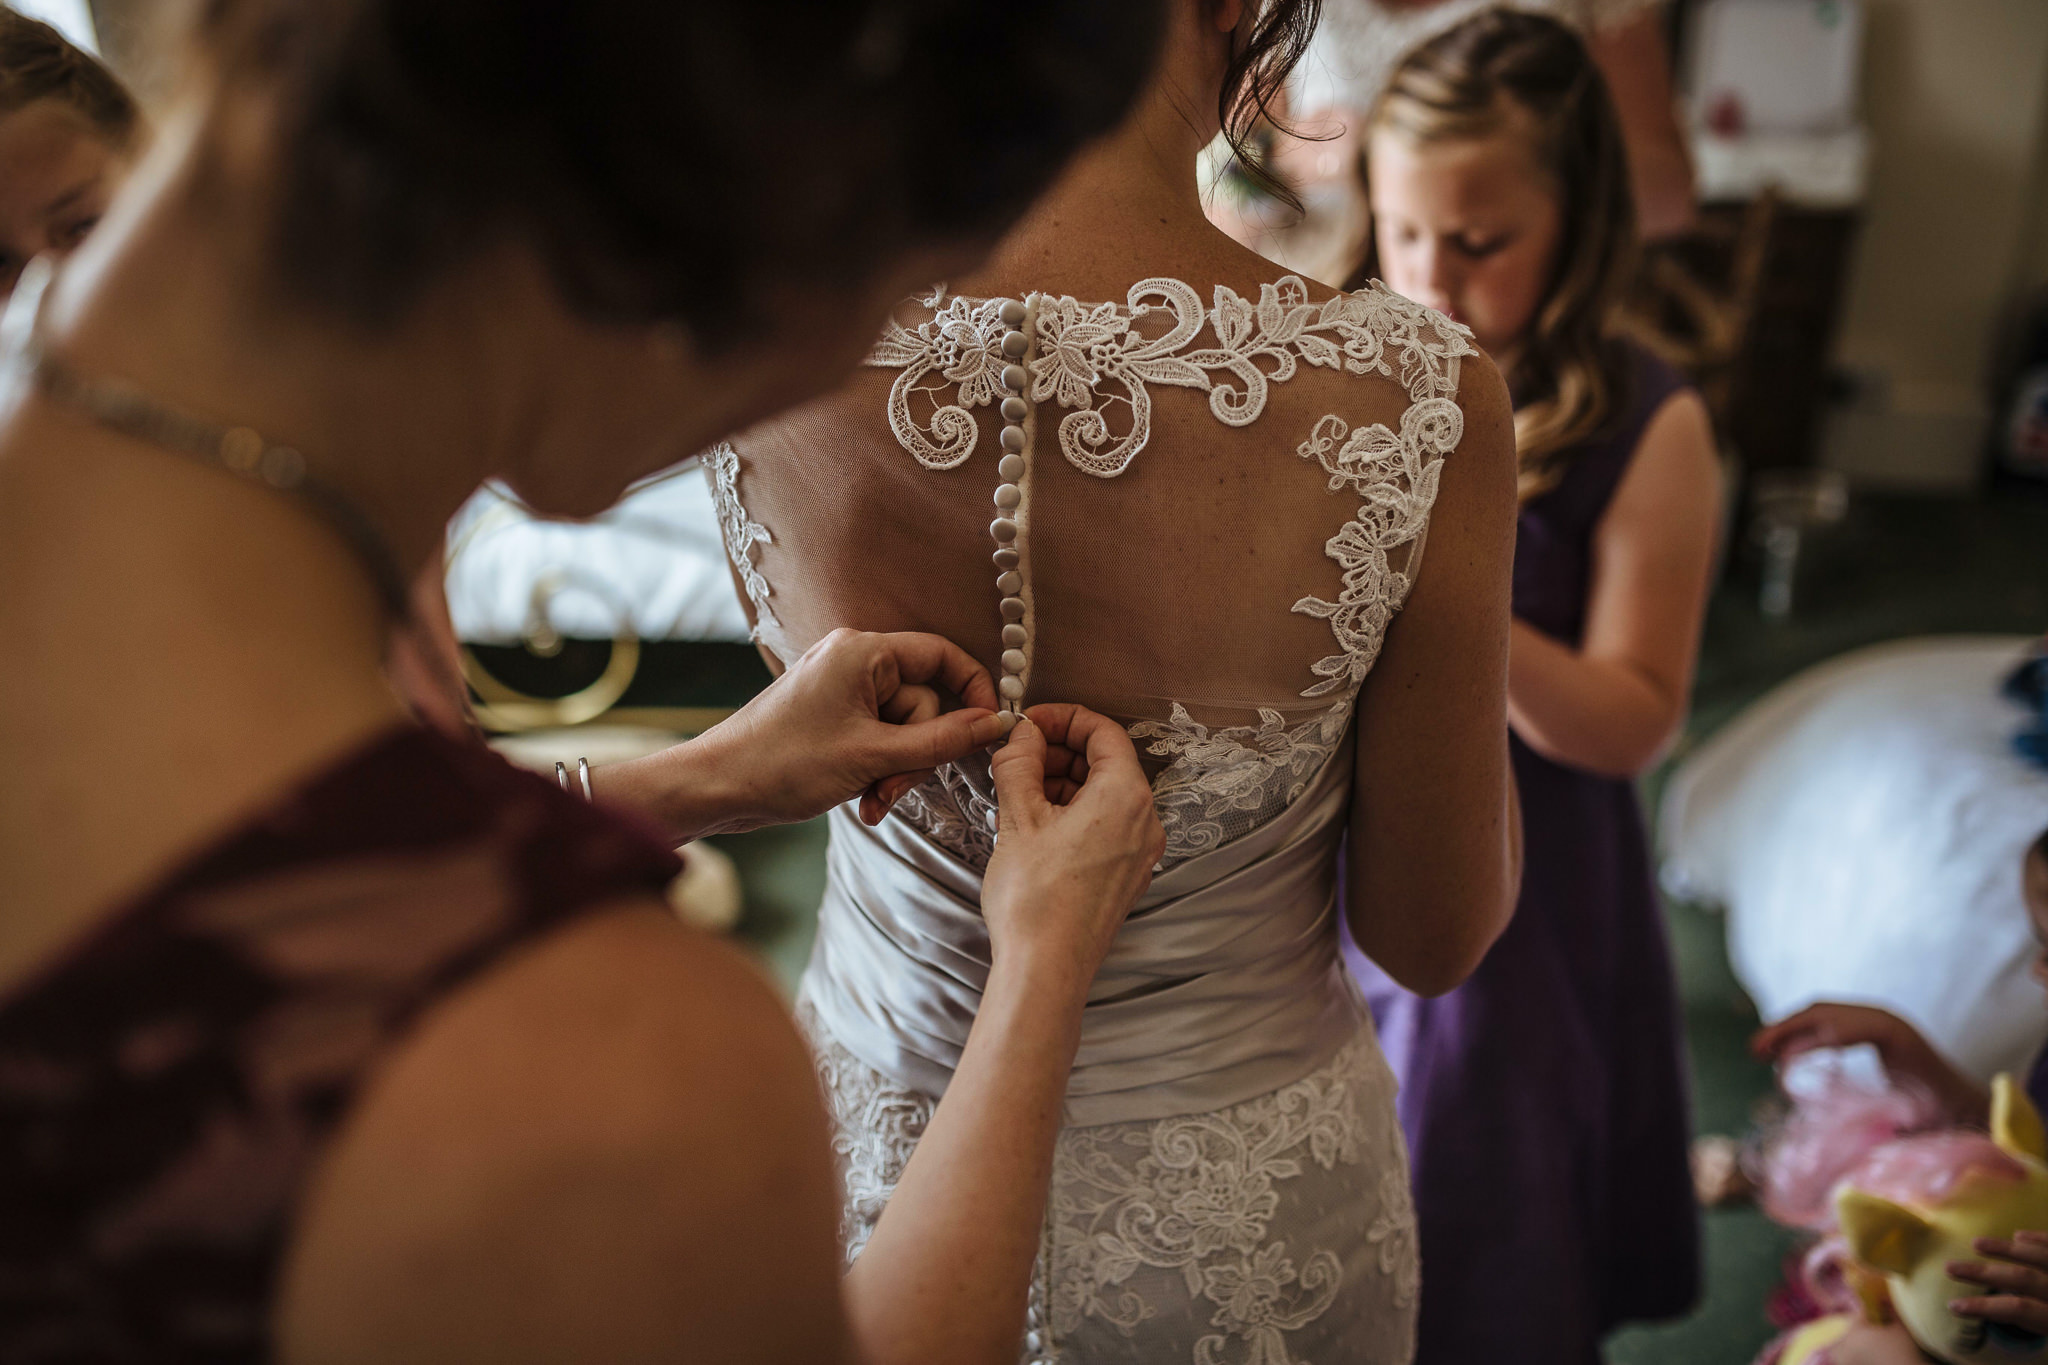 paul-marbrook-Caer-Llan-Wedding-Photographer-90031